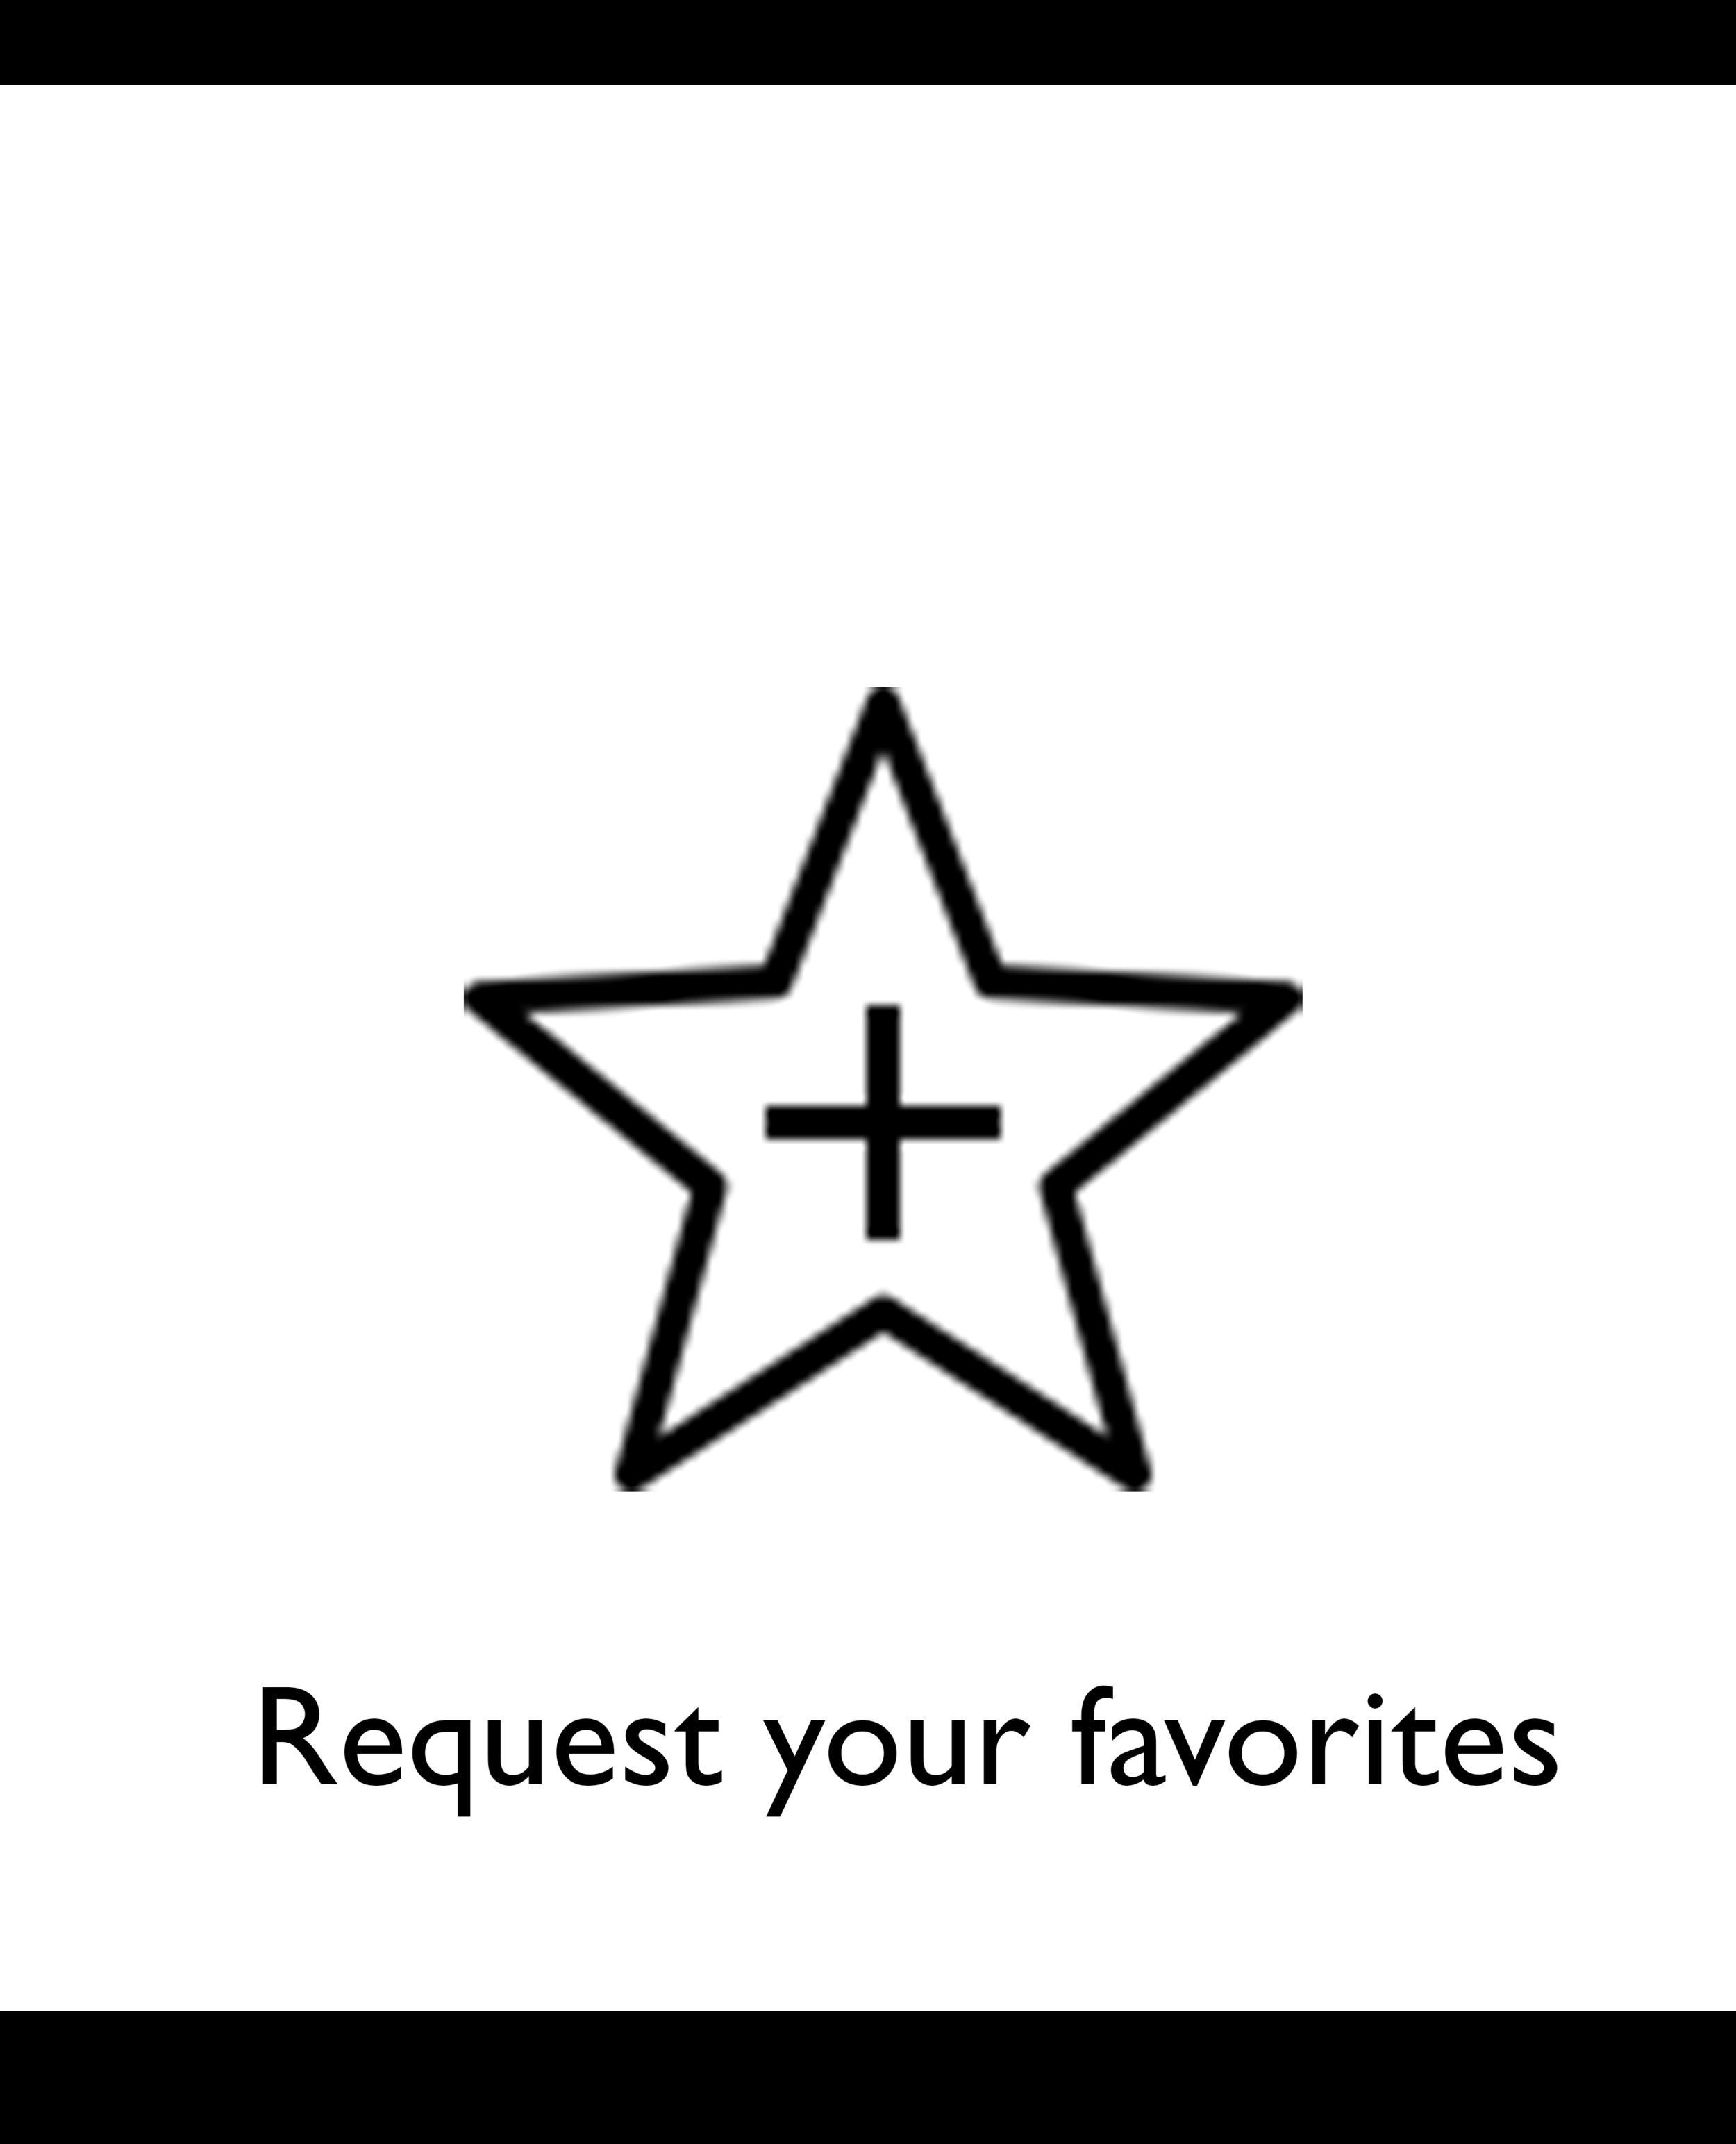 Favorites_png.png